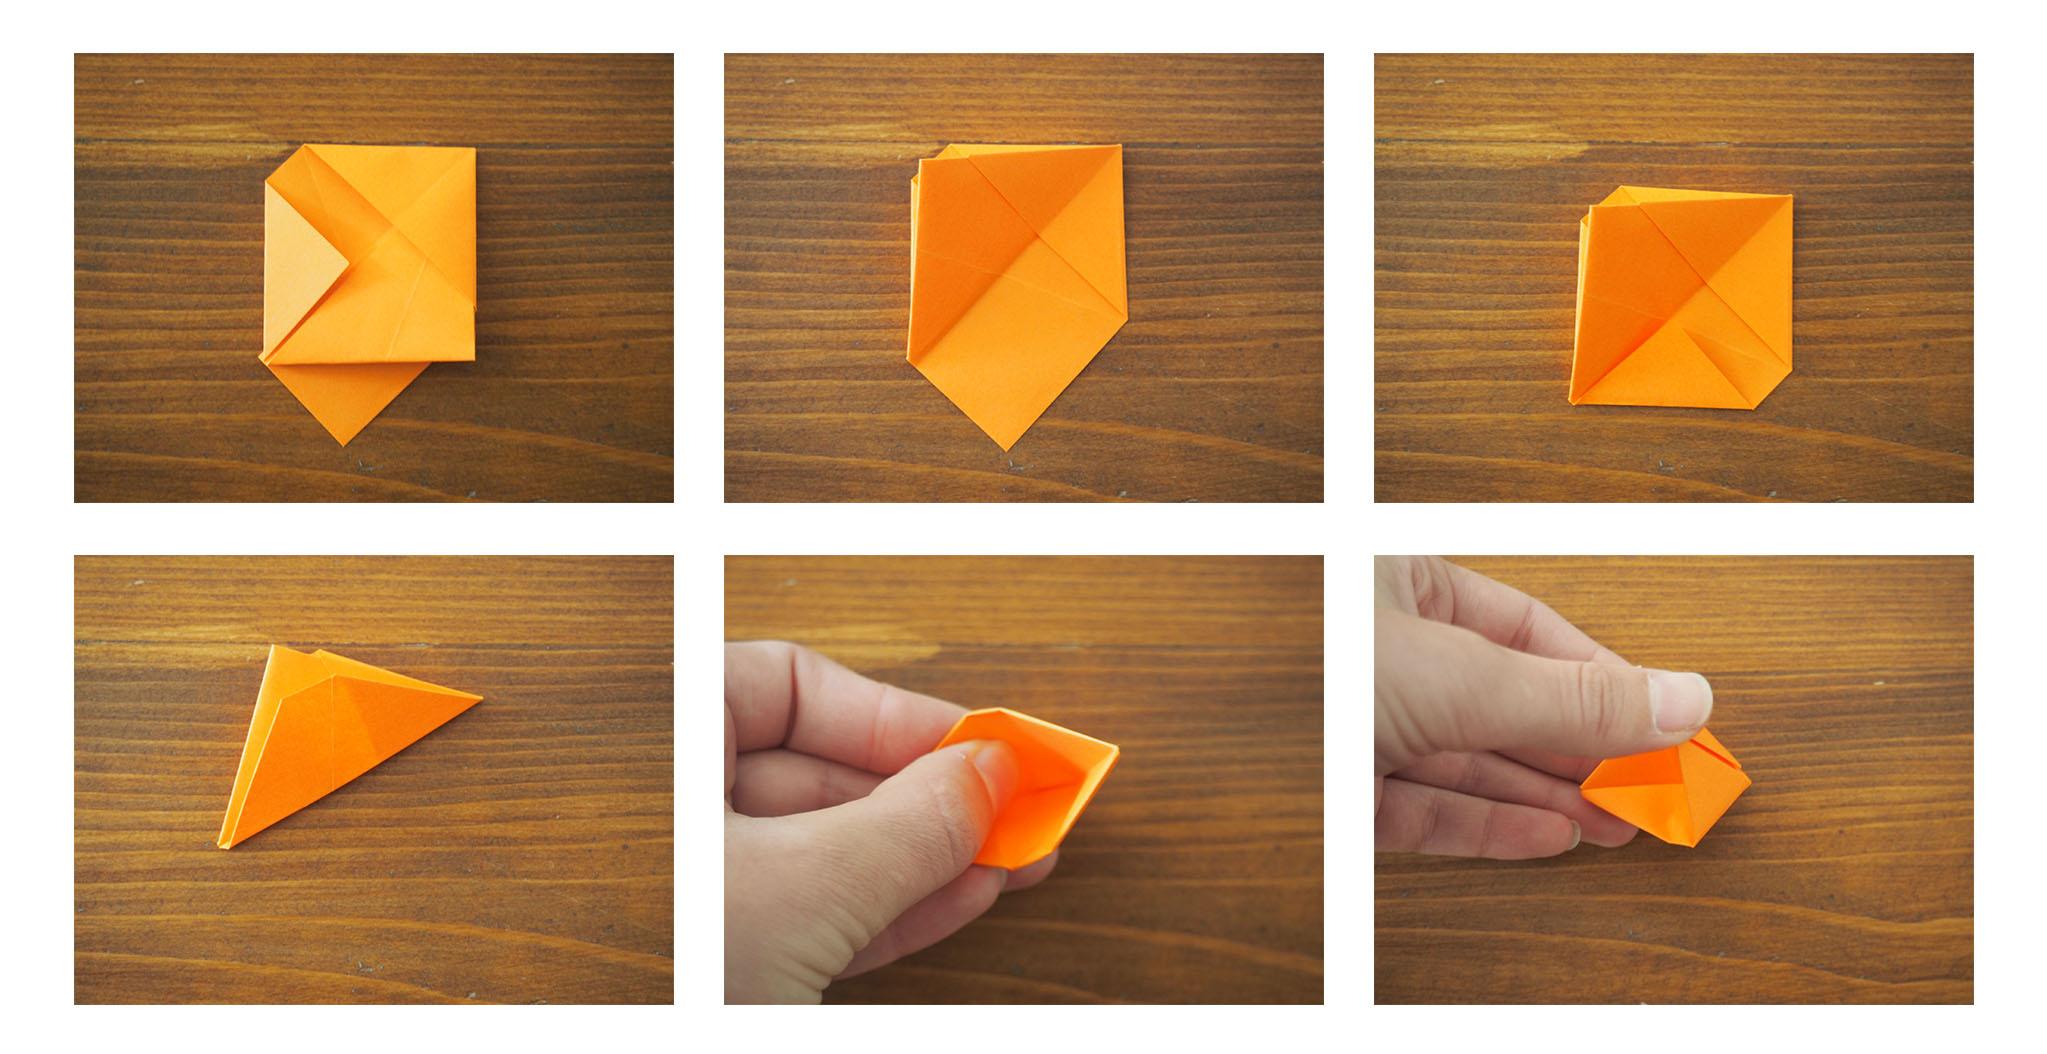 Diy Origami Fleur Facile Une Fleur En Origami Facile R Aliser